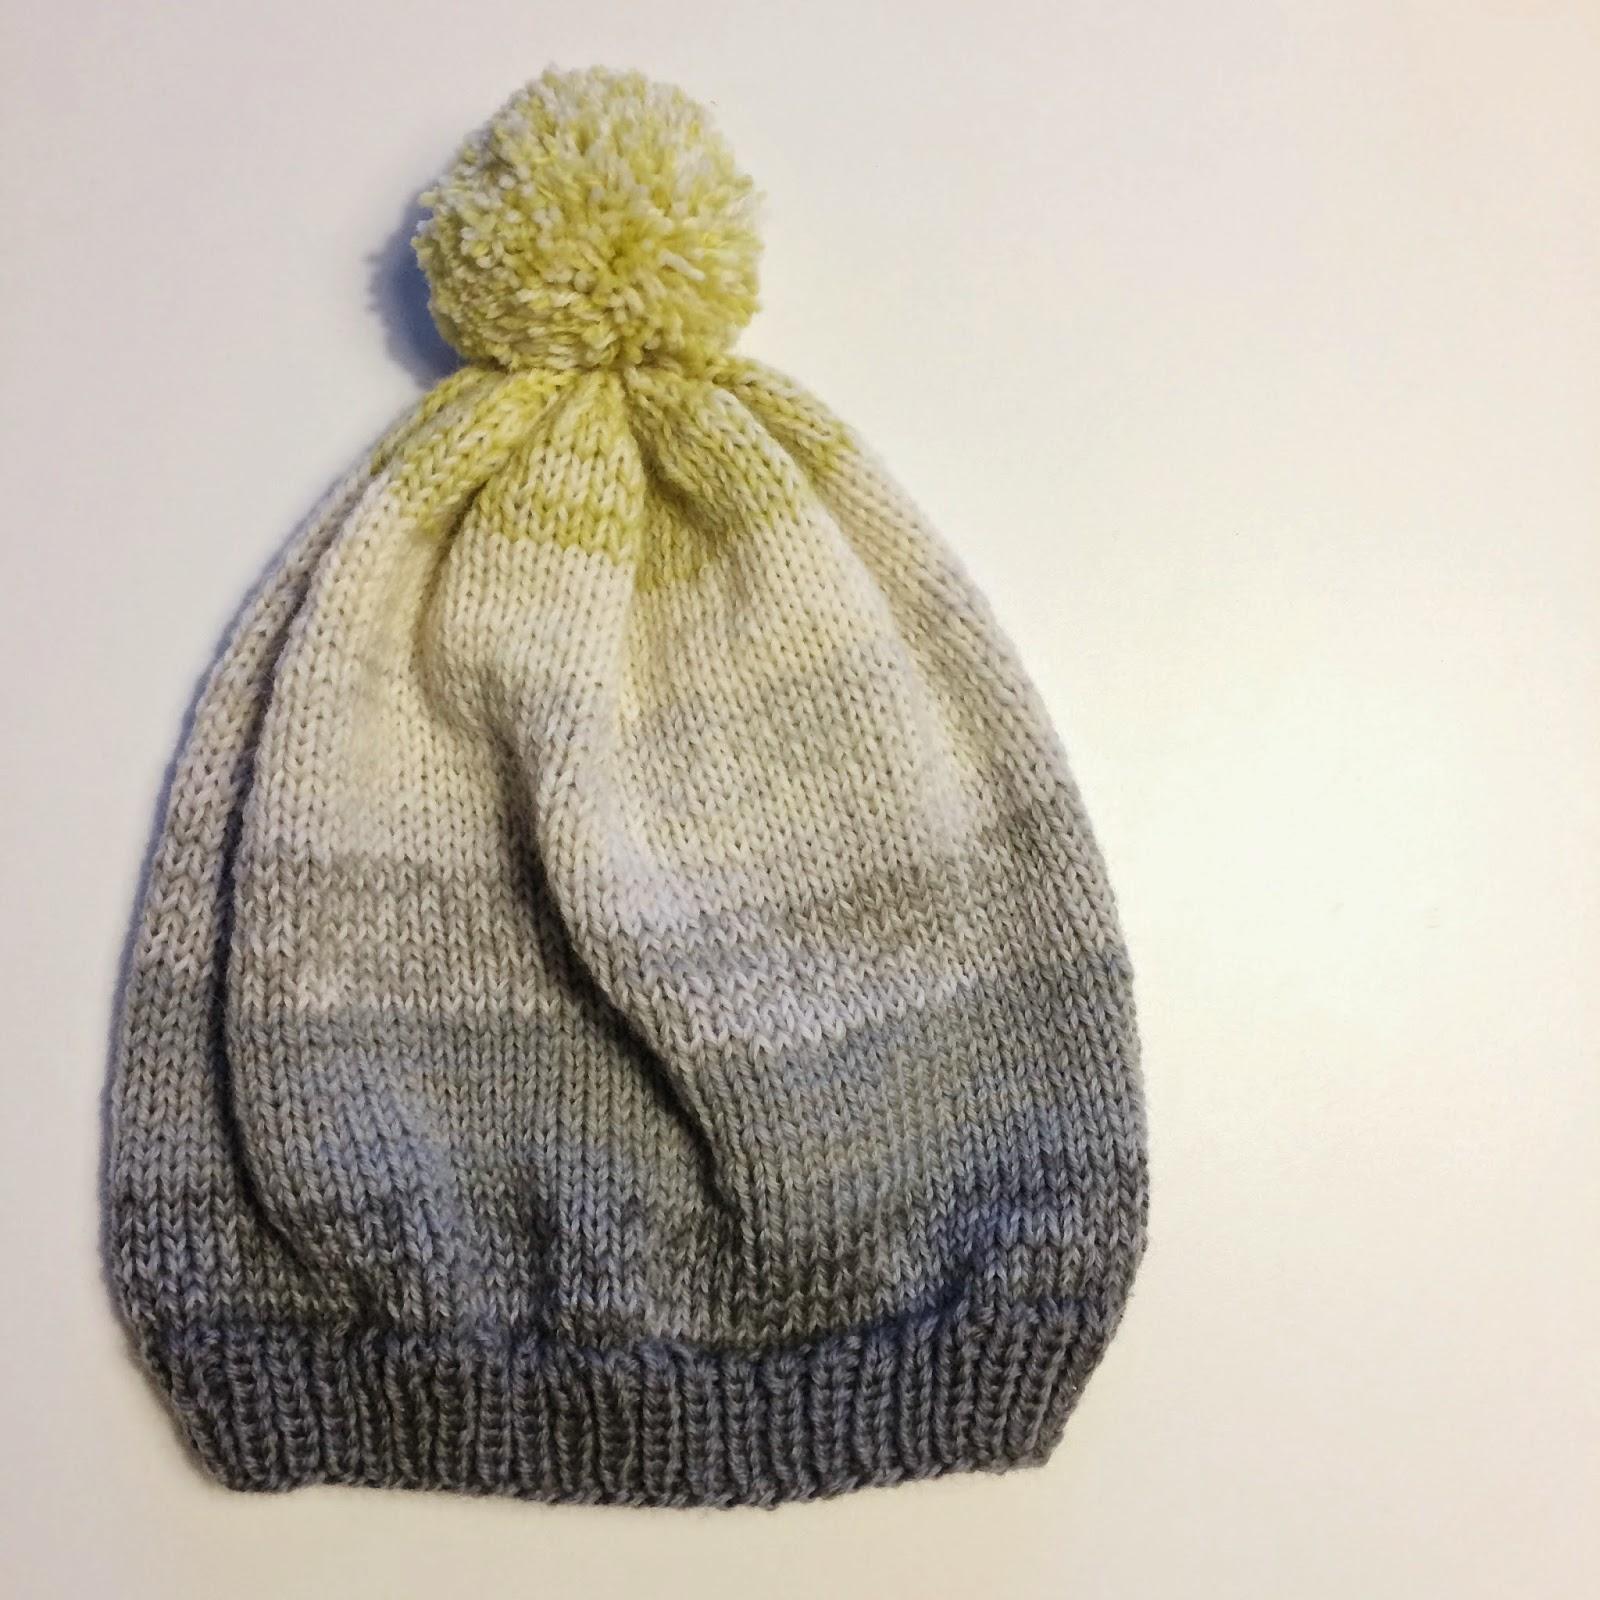 Beanie; easy knitting pattern from Meraki